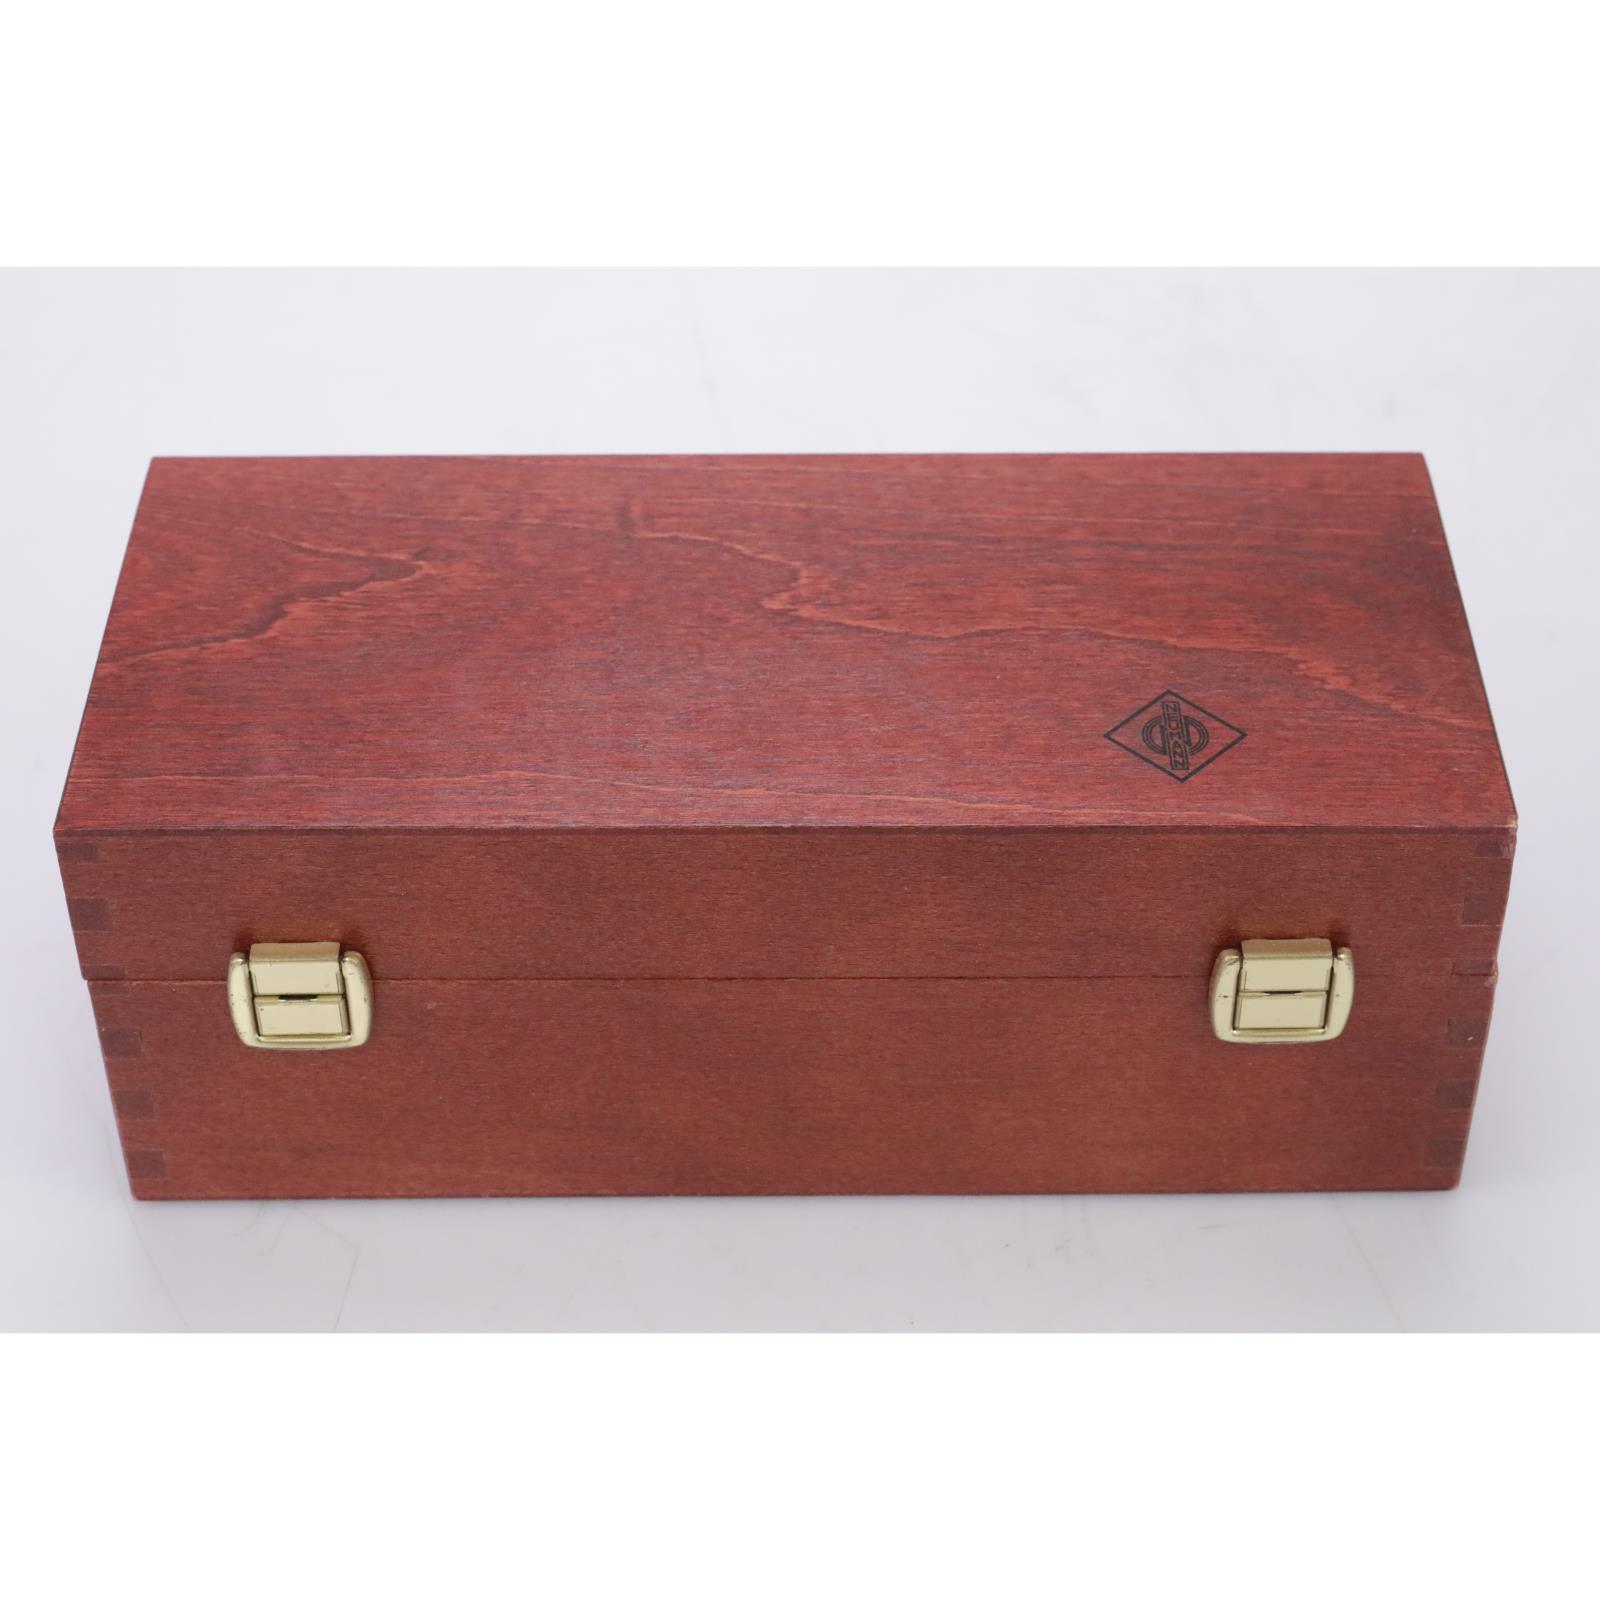 Neumann U89i Wooden Microphone Case #43961